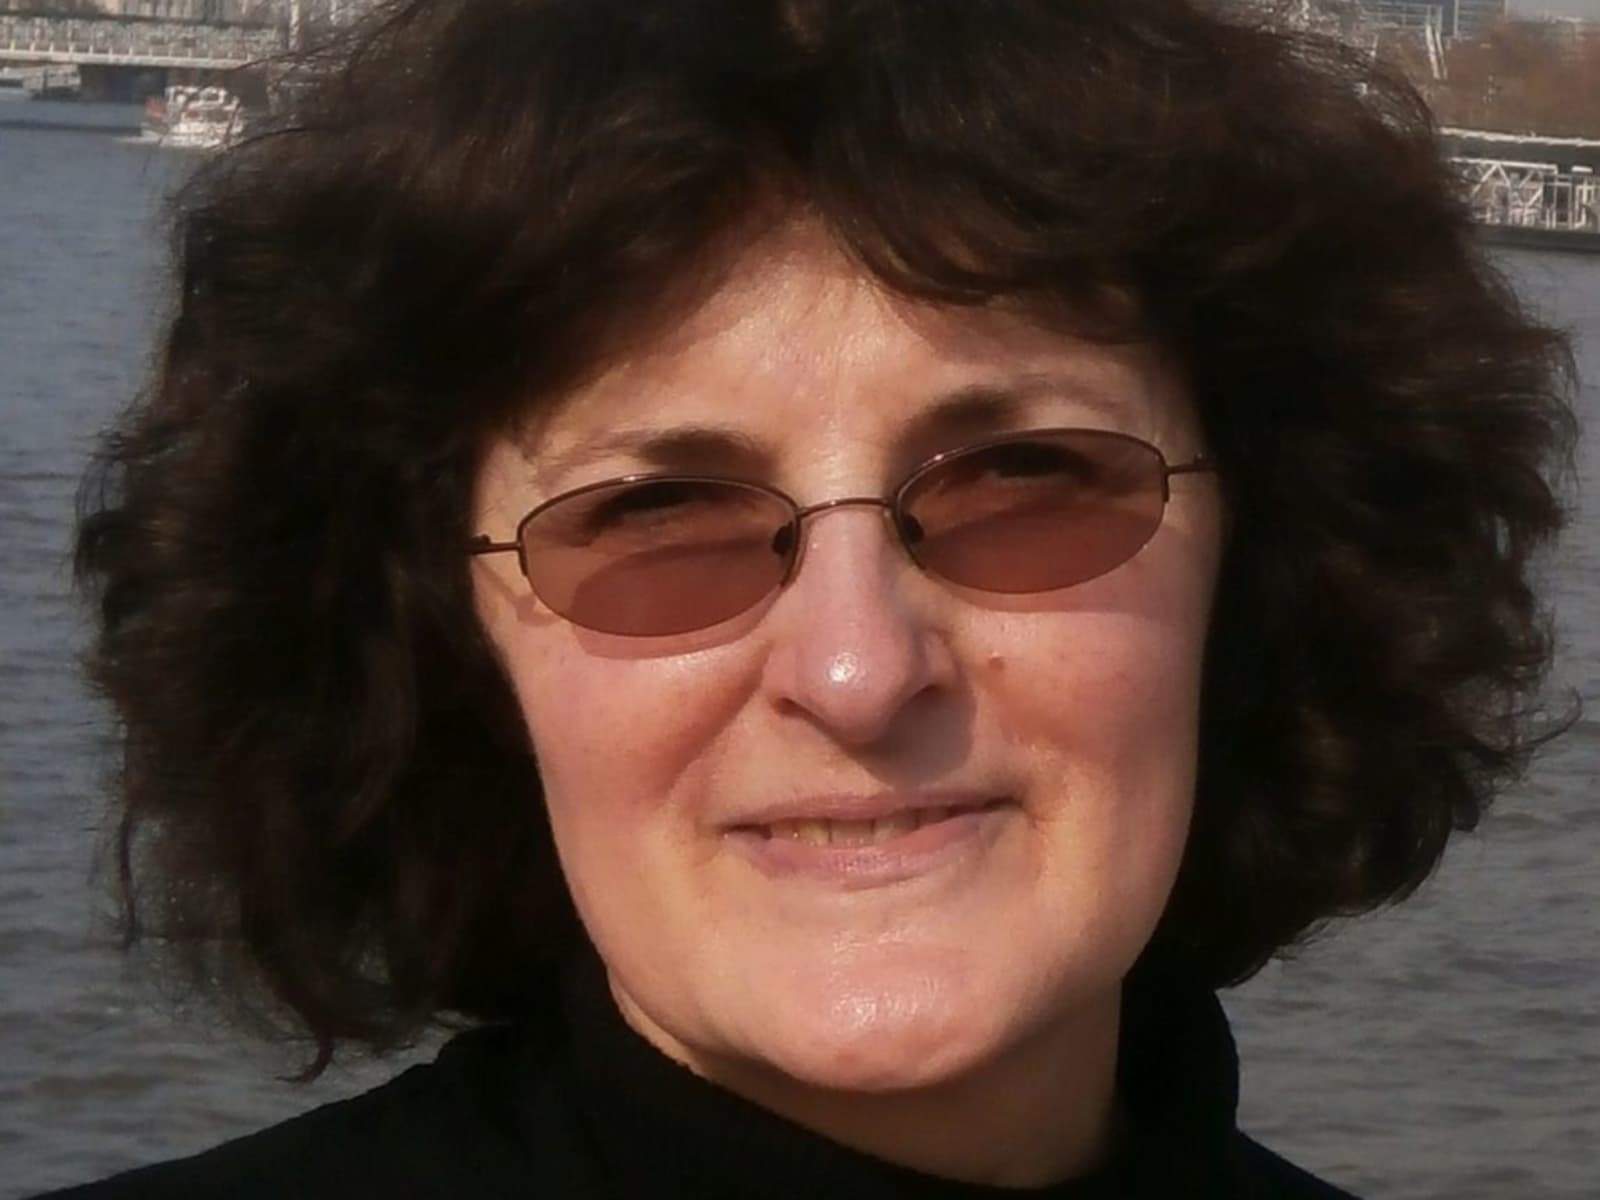 Ruth from Norwich, United Kingdom